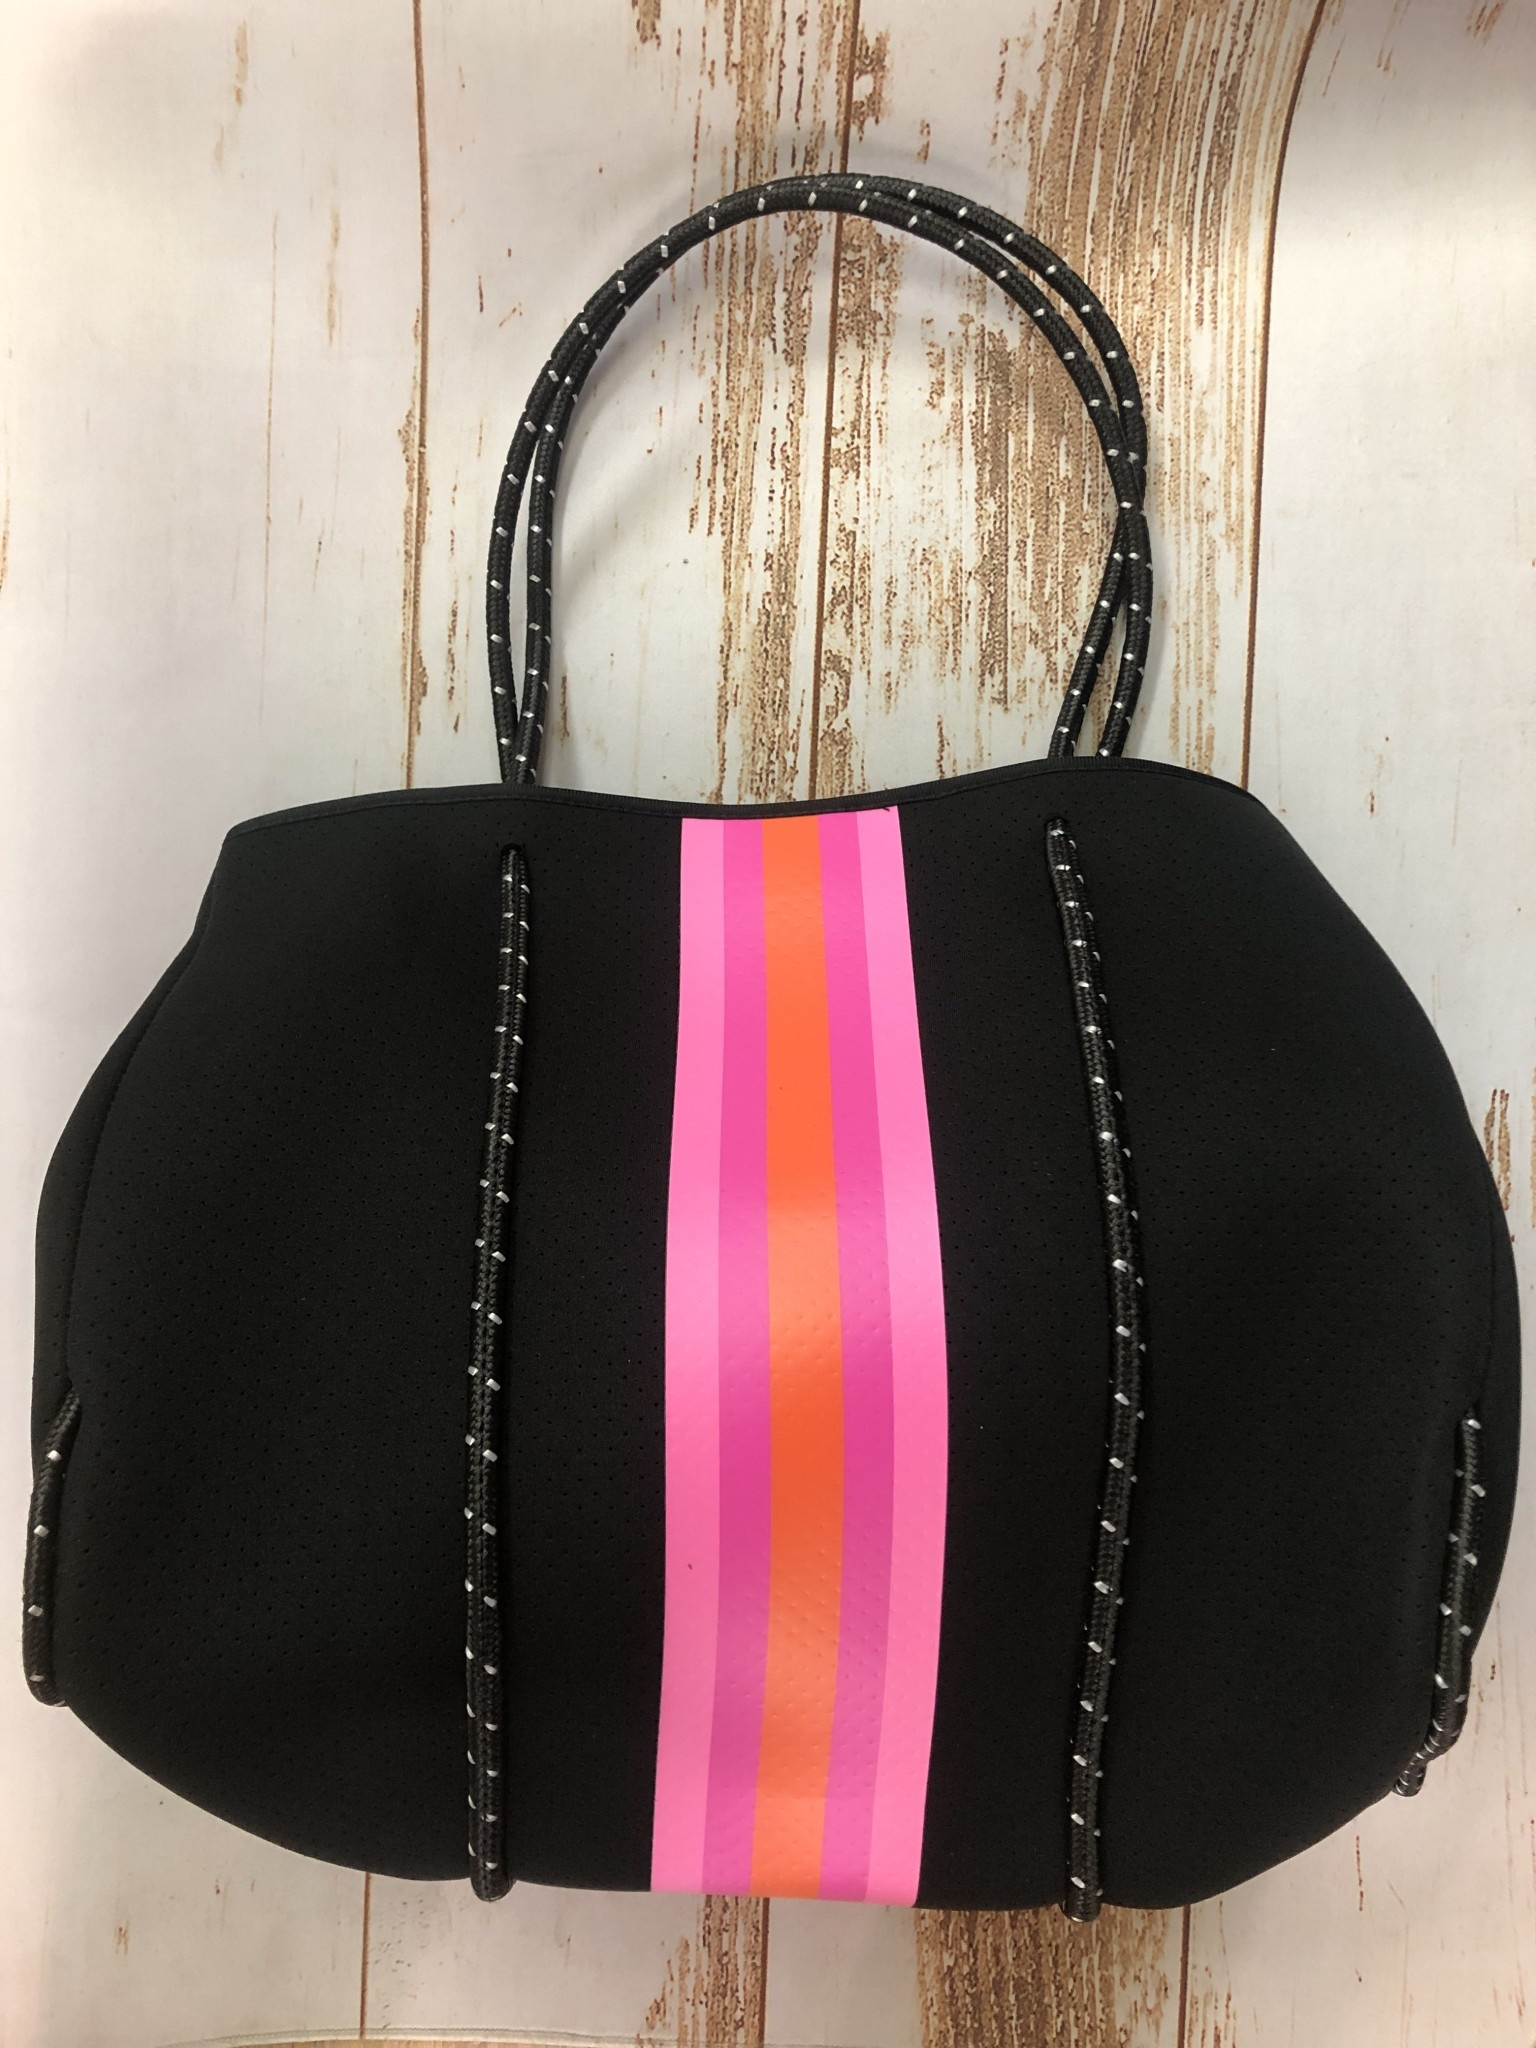 Haute Shore Ltd Greyson Tote - Rave - Black pink/orange stripe